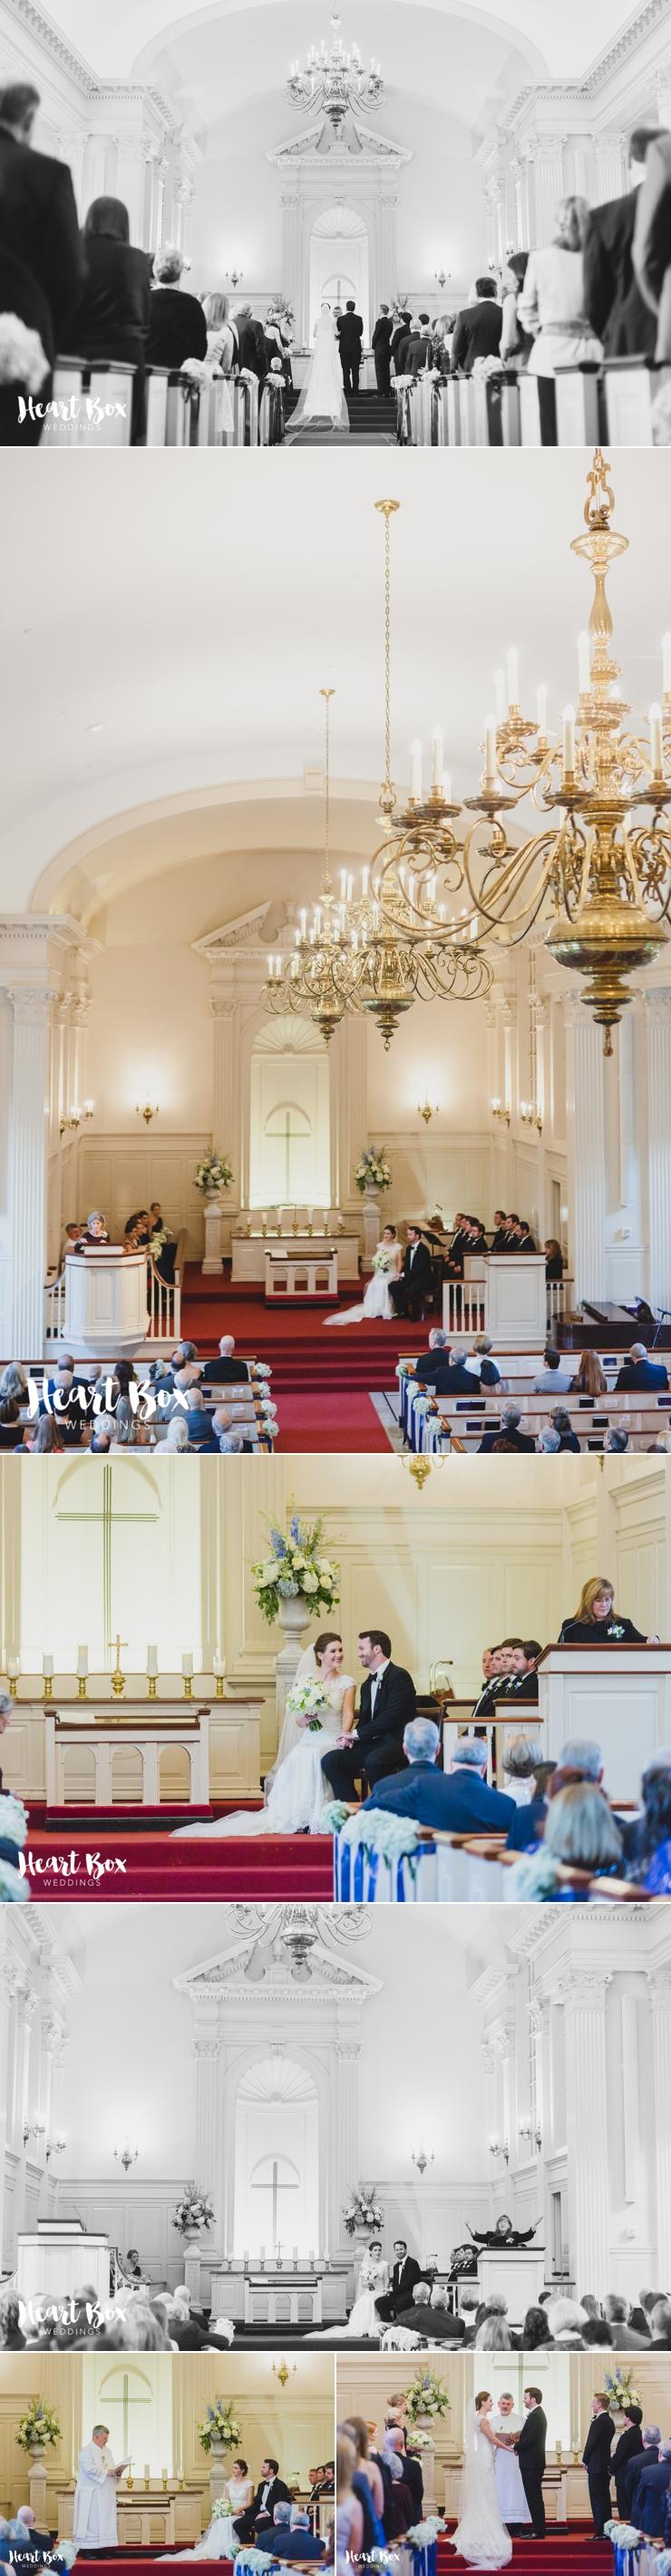 Anthony Wedding Blog Collages 13.jpg